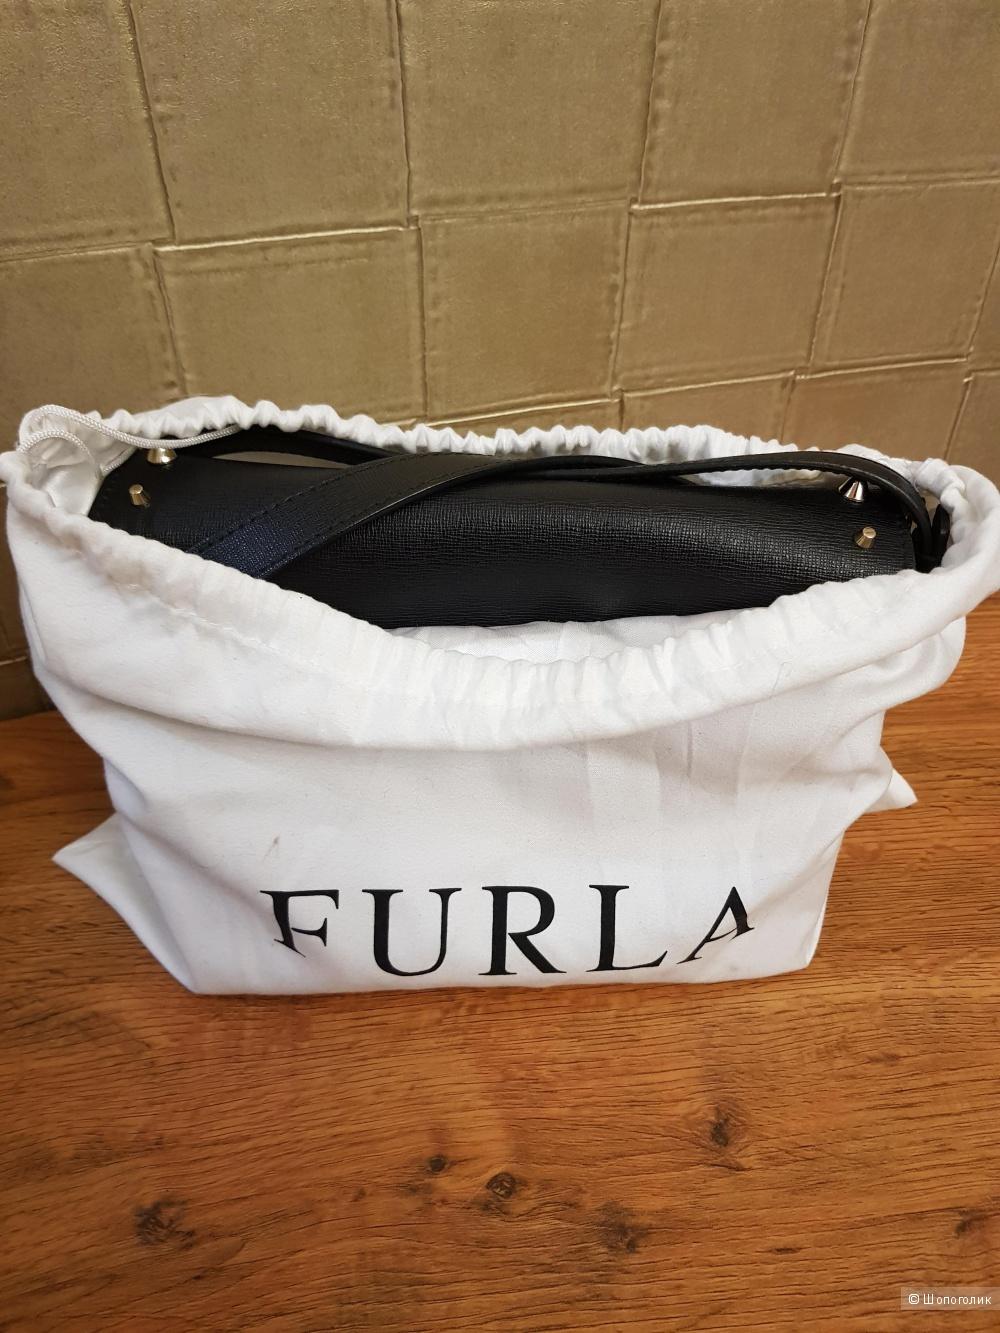 Сумка Furla Julia, 22,5*8,5*16 см